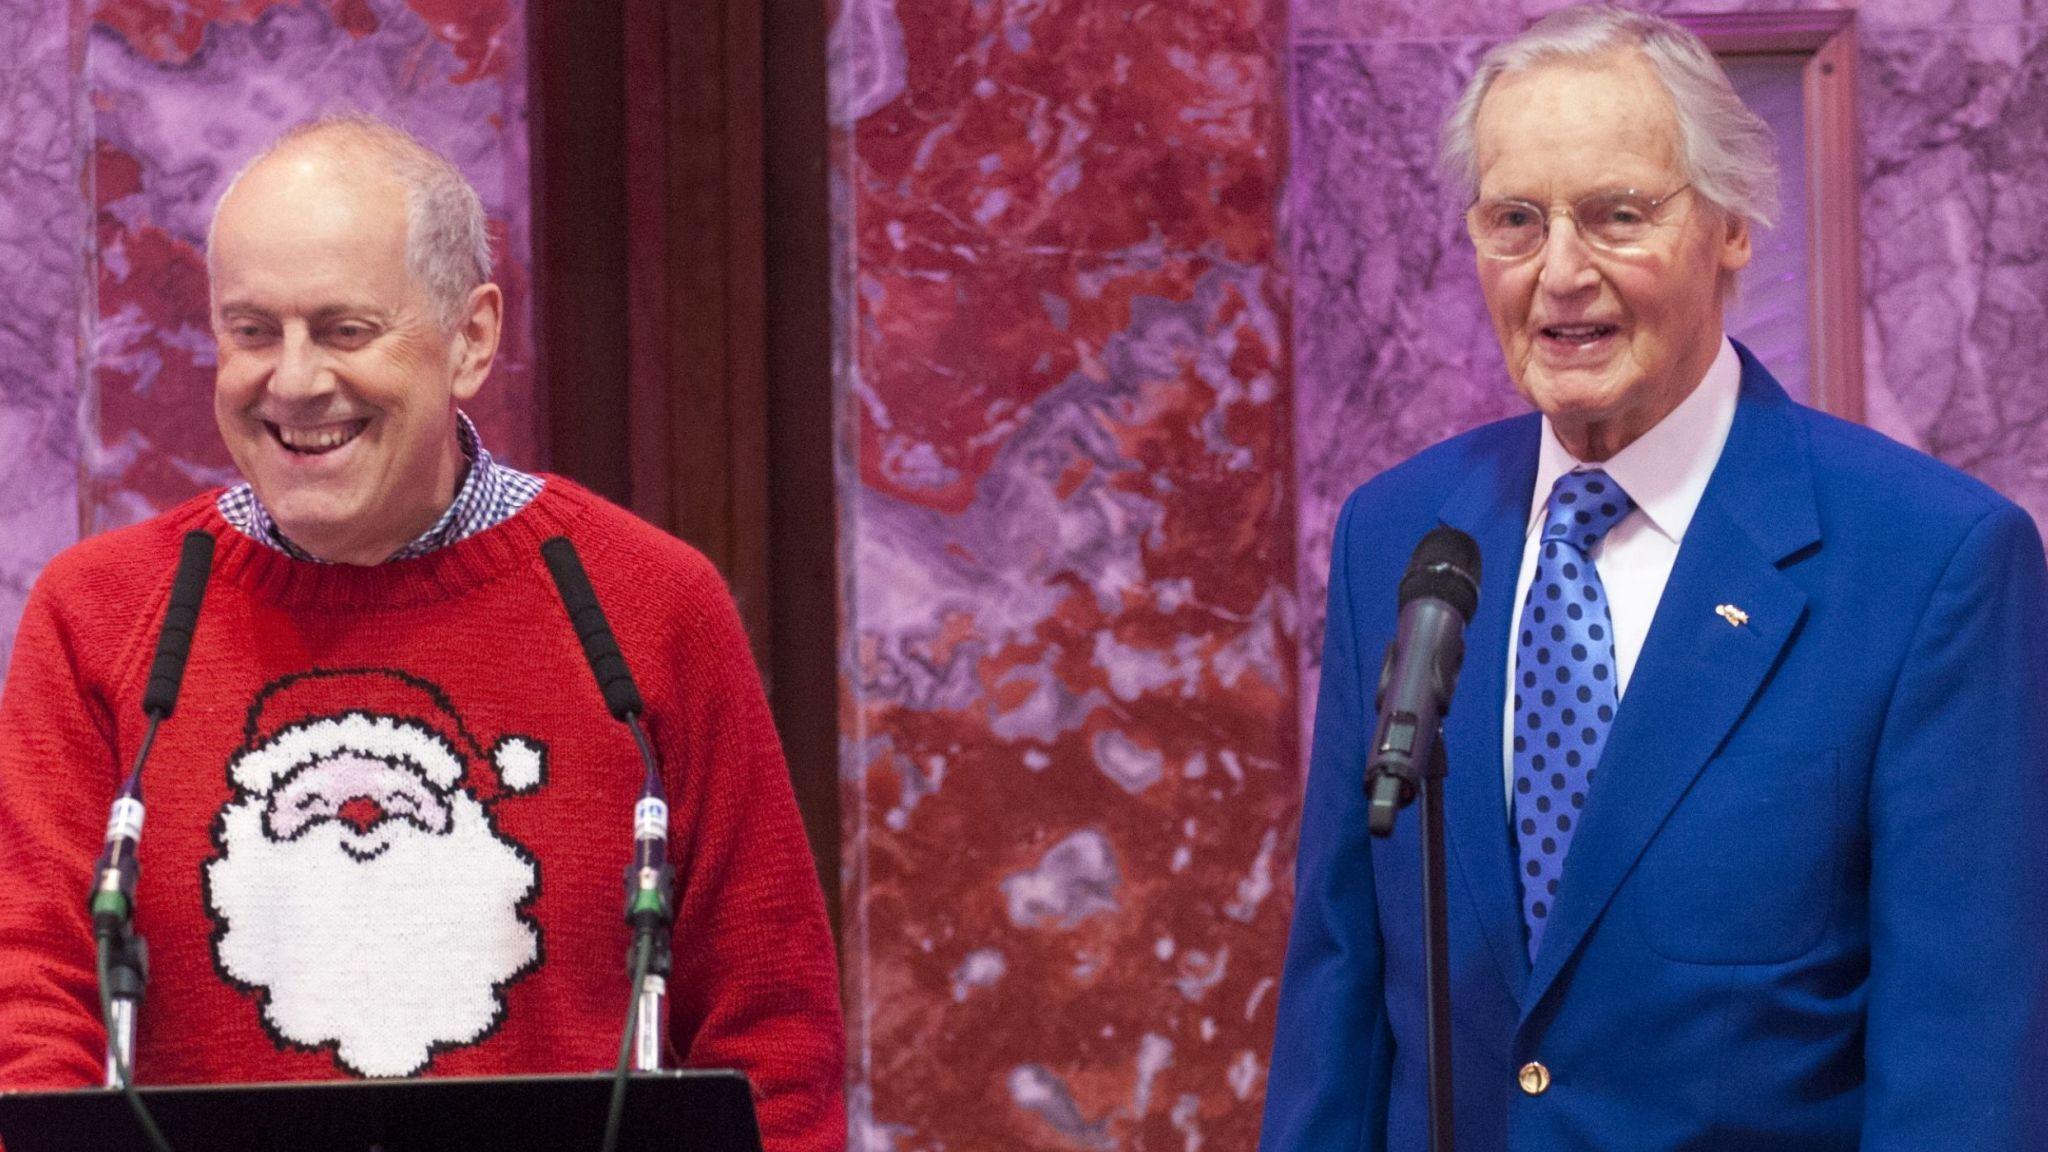 Gyles Brandreth and Nicholas Parsons in 2014. Pic: David Parker/ANL/Shutterstock